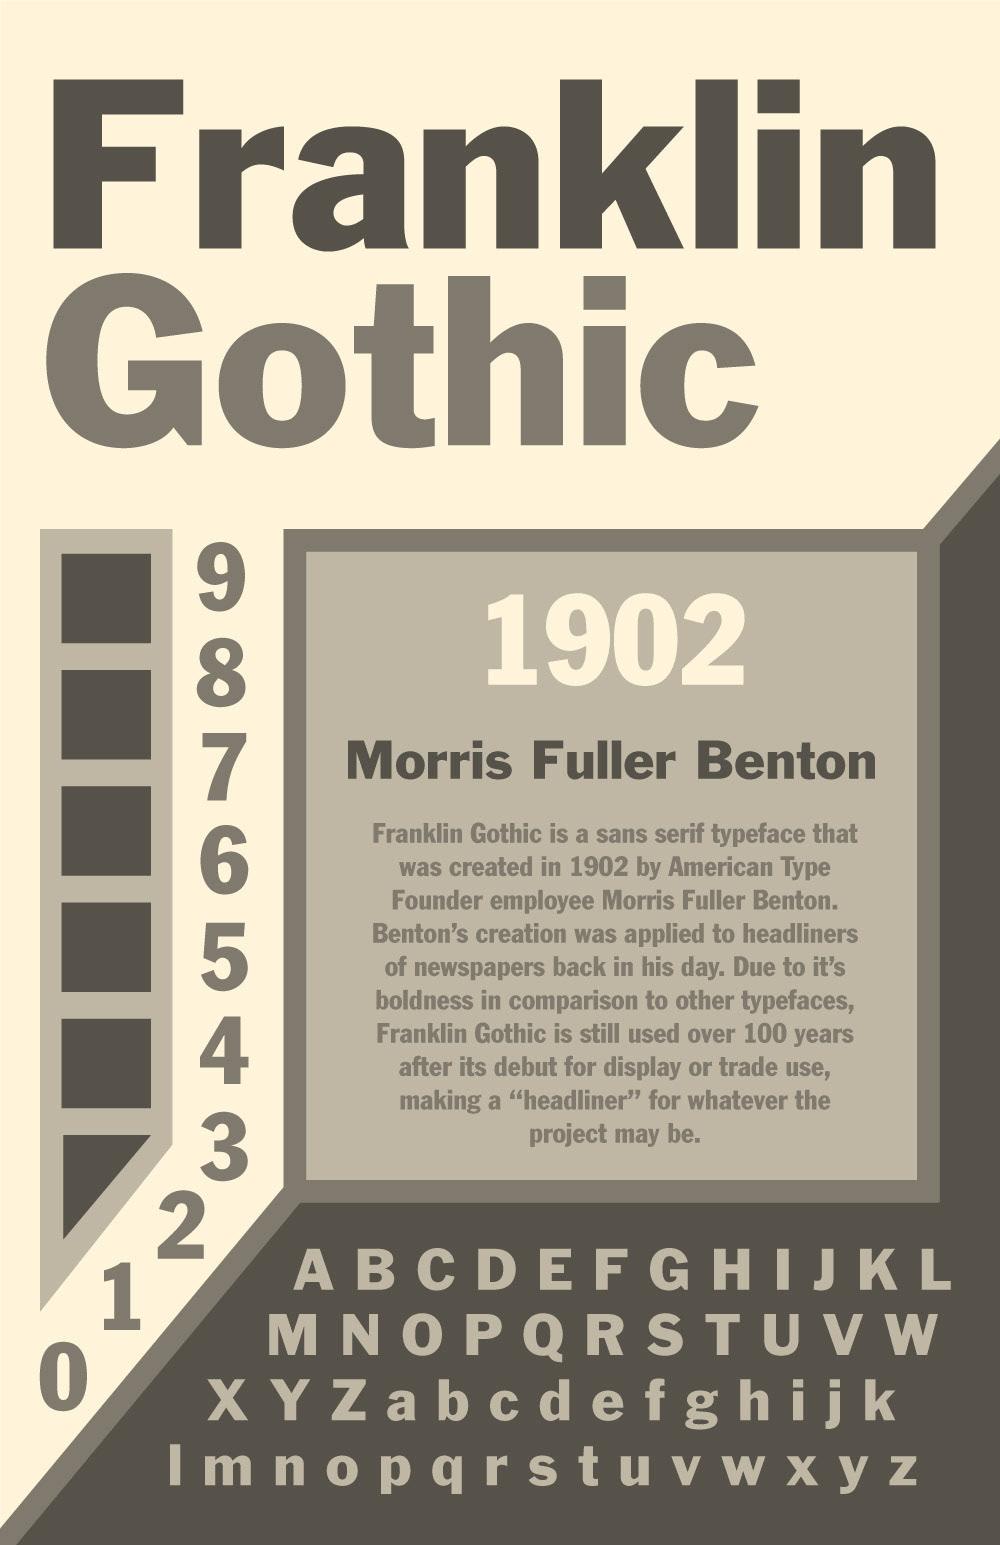 Franklin Gothic Typeface Study Adobe Illustrator on Behance